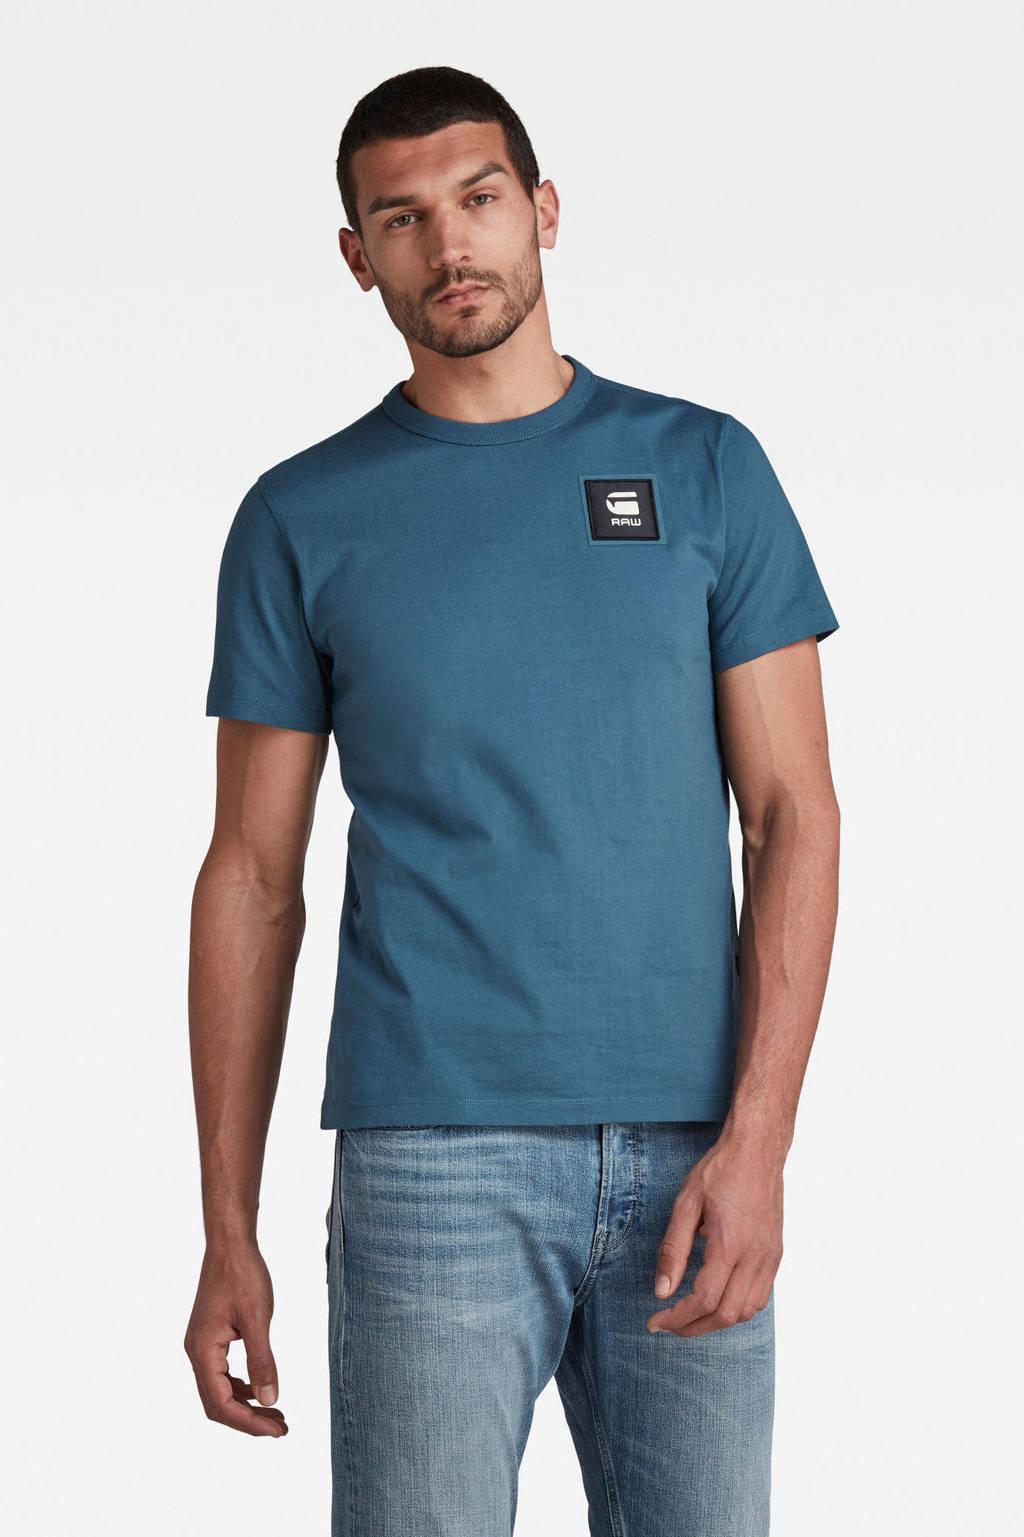 G-Star RAW T-shirt van biologisch katoen bright nickel, Bright nickel